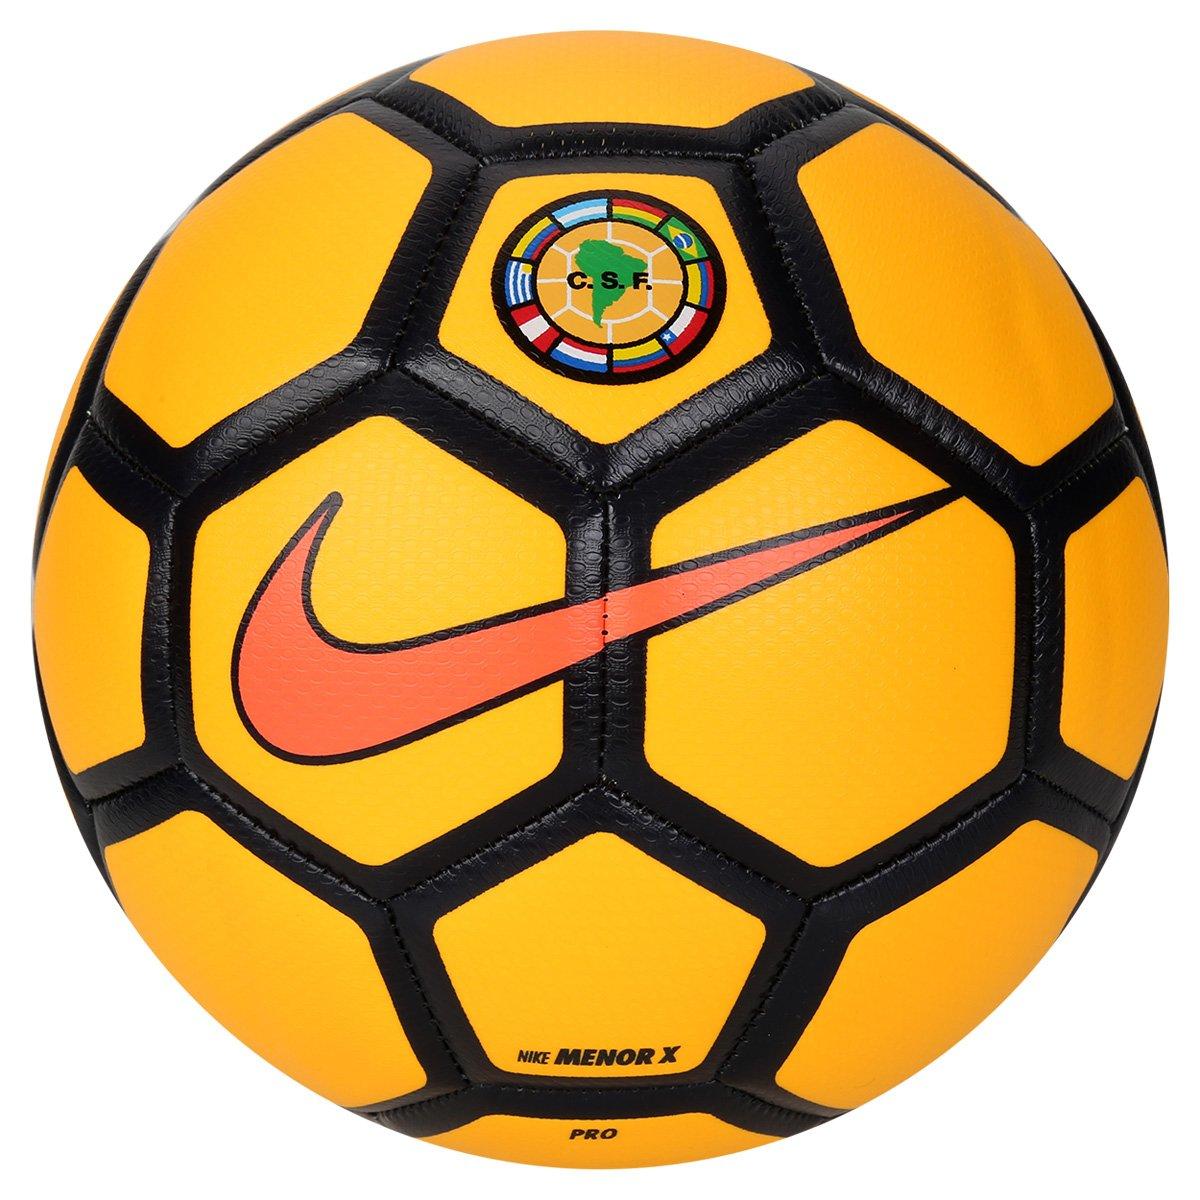 Bola Futebol Nike FootballX Menor CSF Futsal - Compre Agora  9630627a03bc7